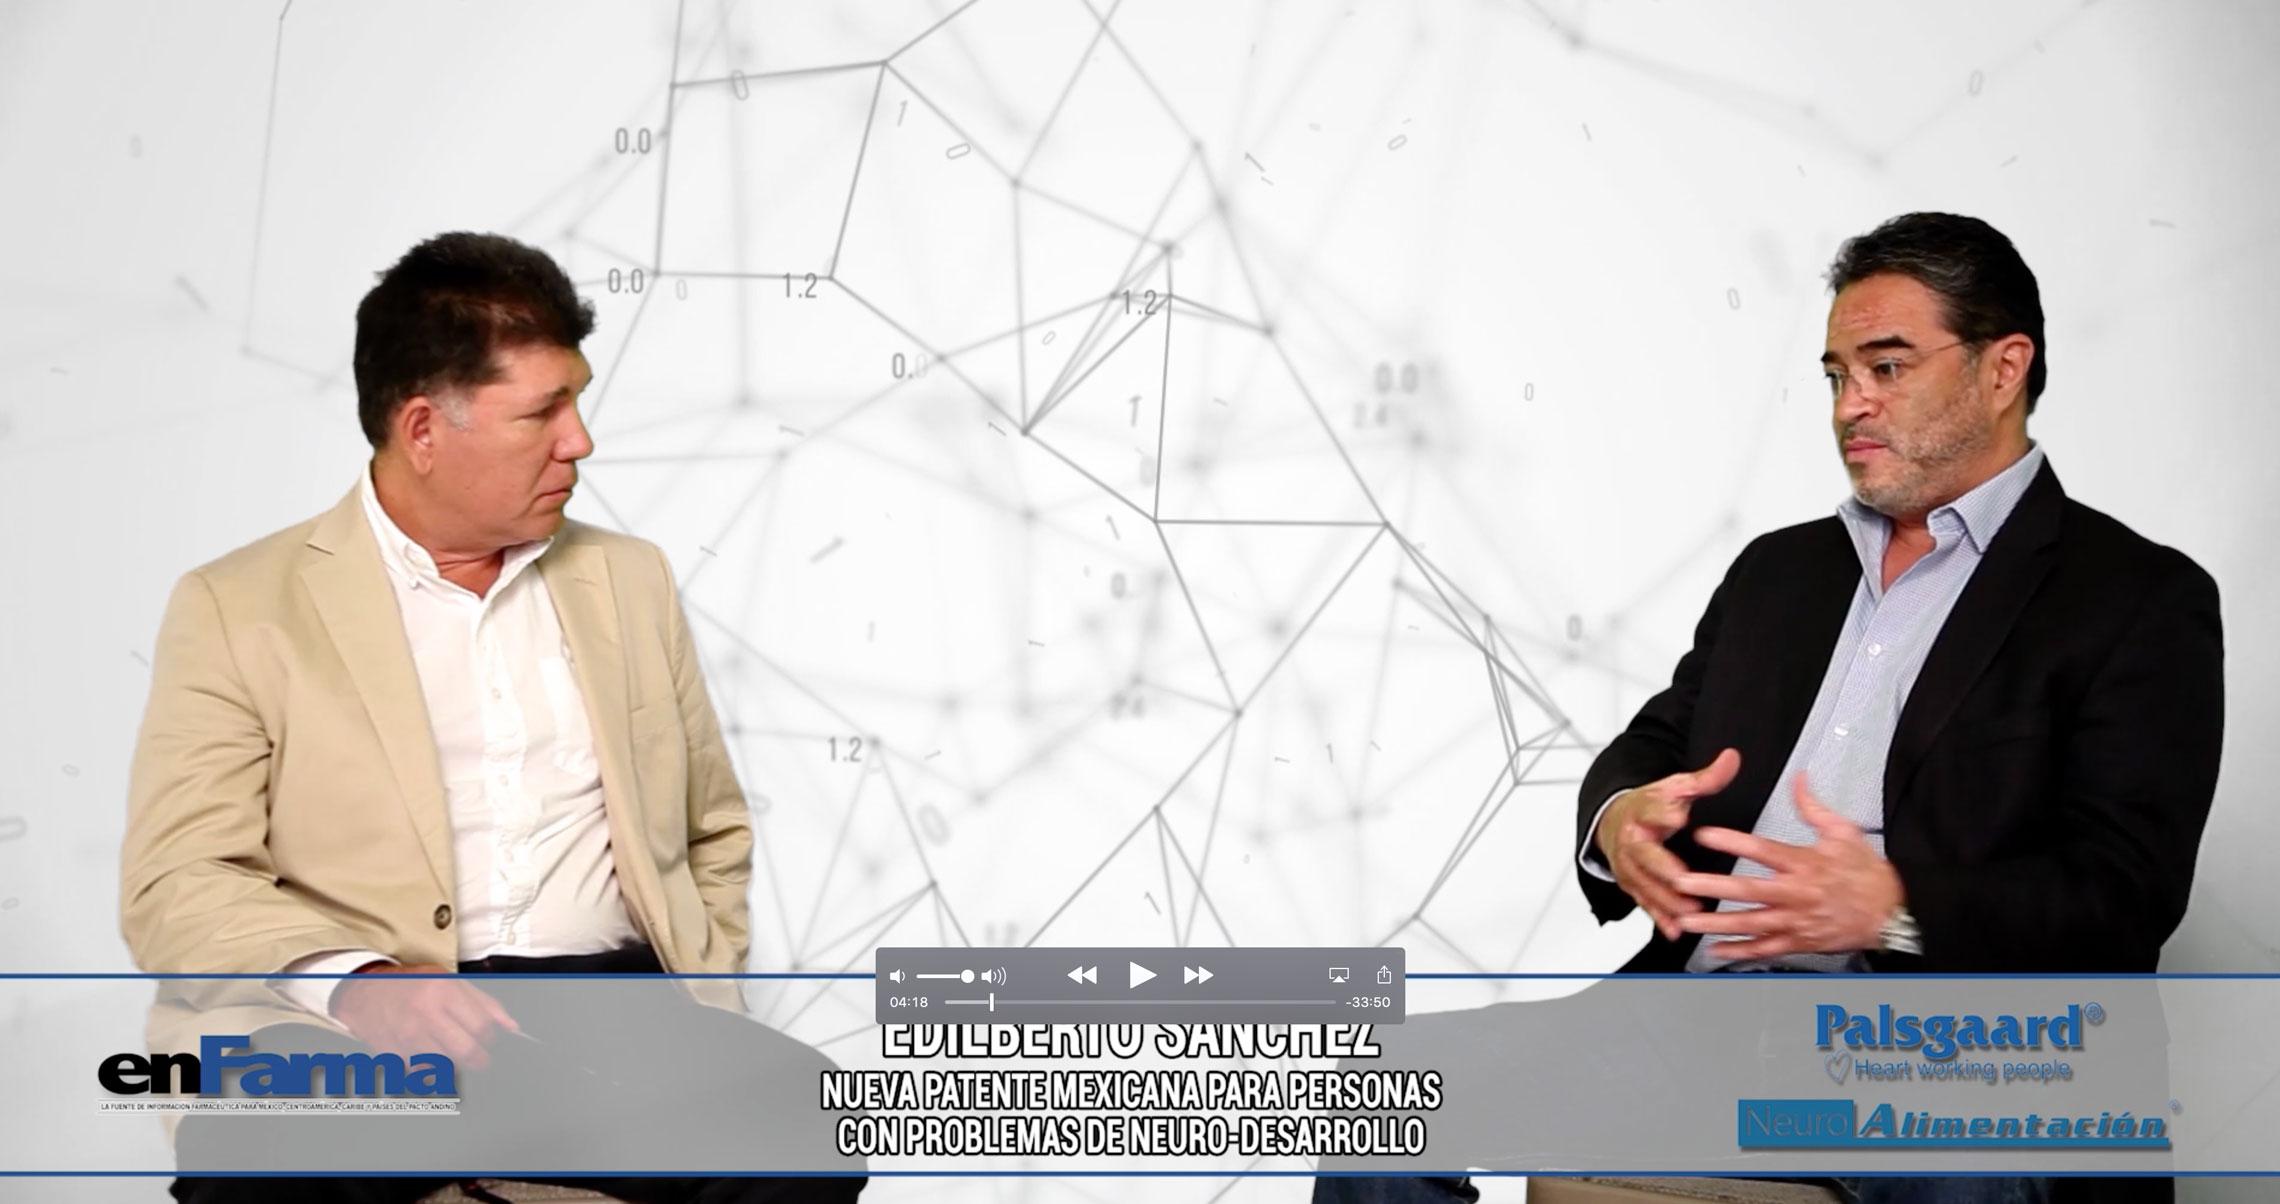 Entrevista a Edilberto Sánchez - Palsgaard